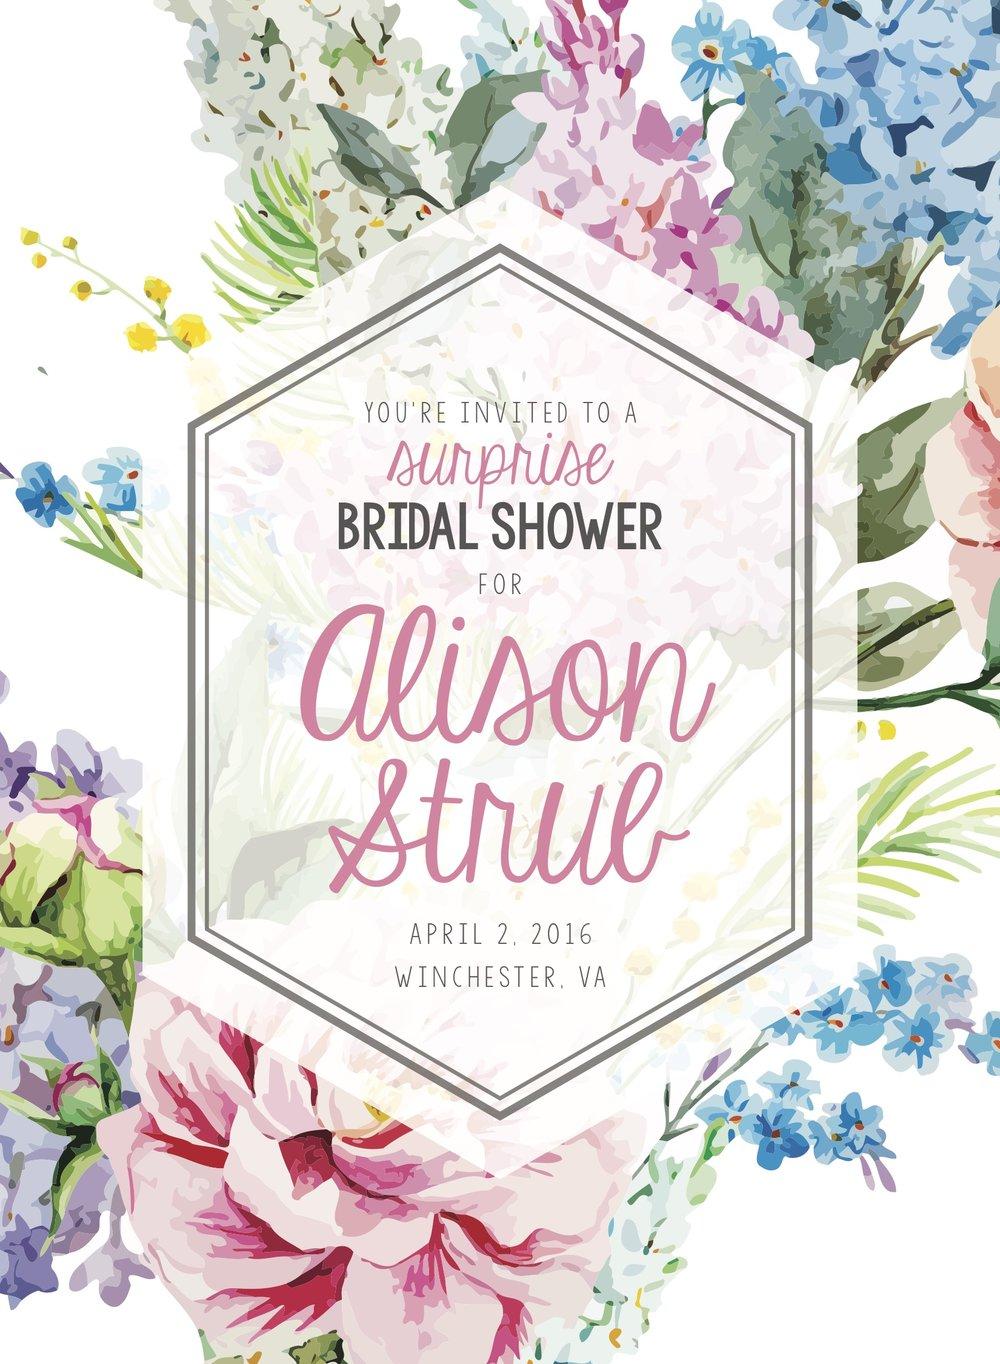 Alison-Strub-Shower_Final.jpg